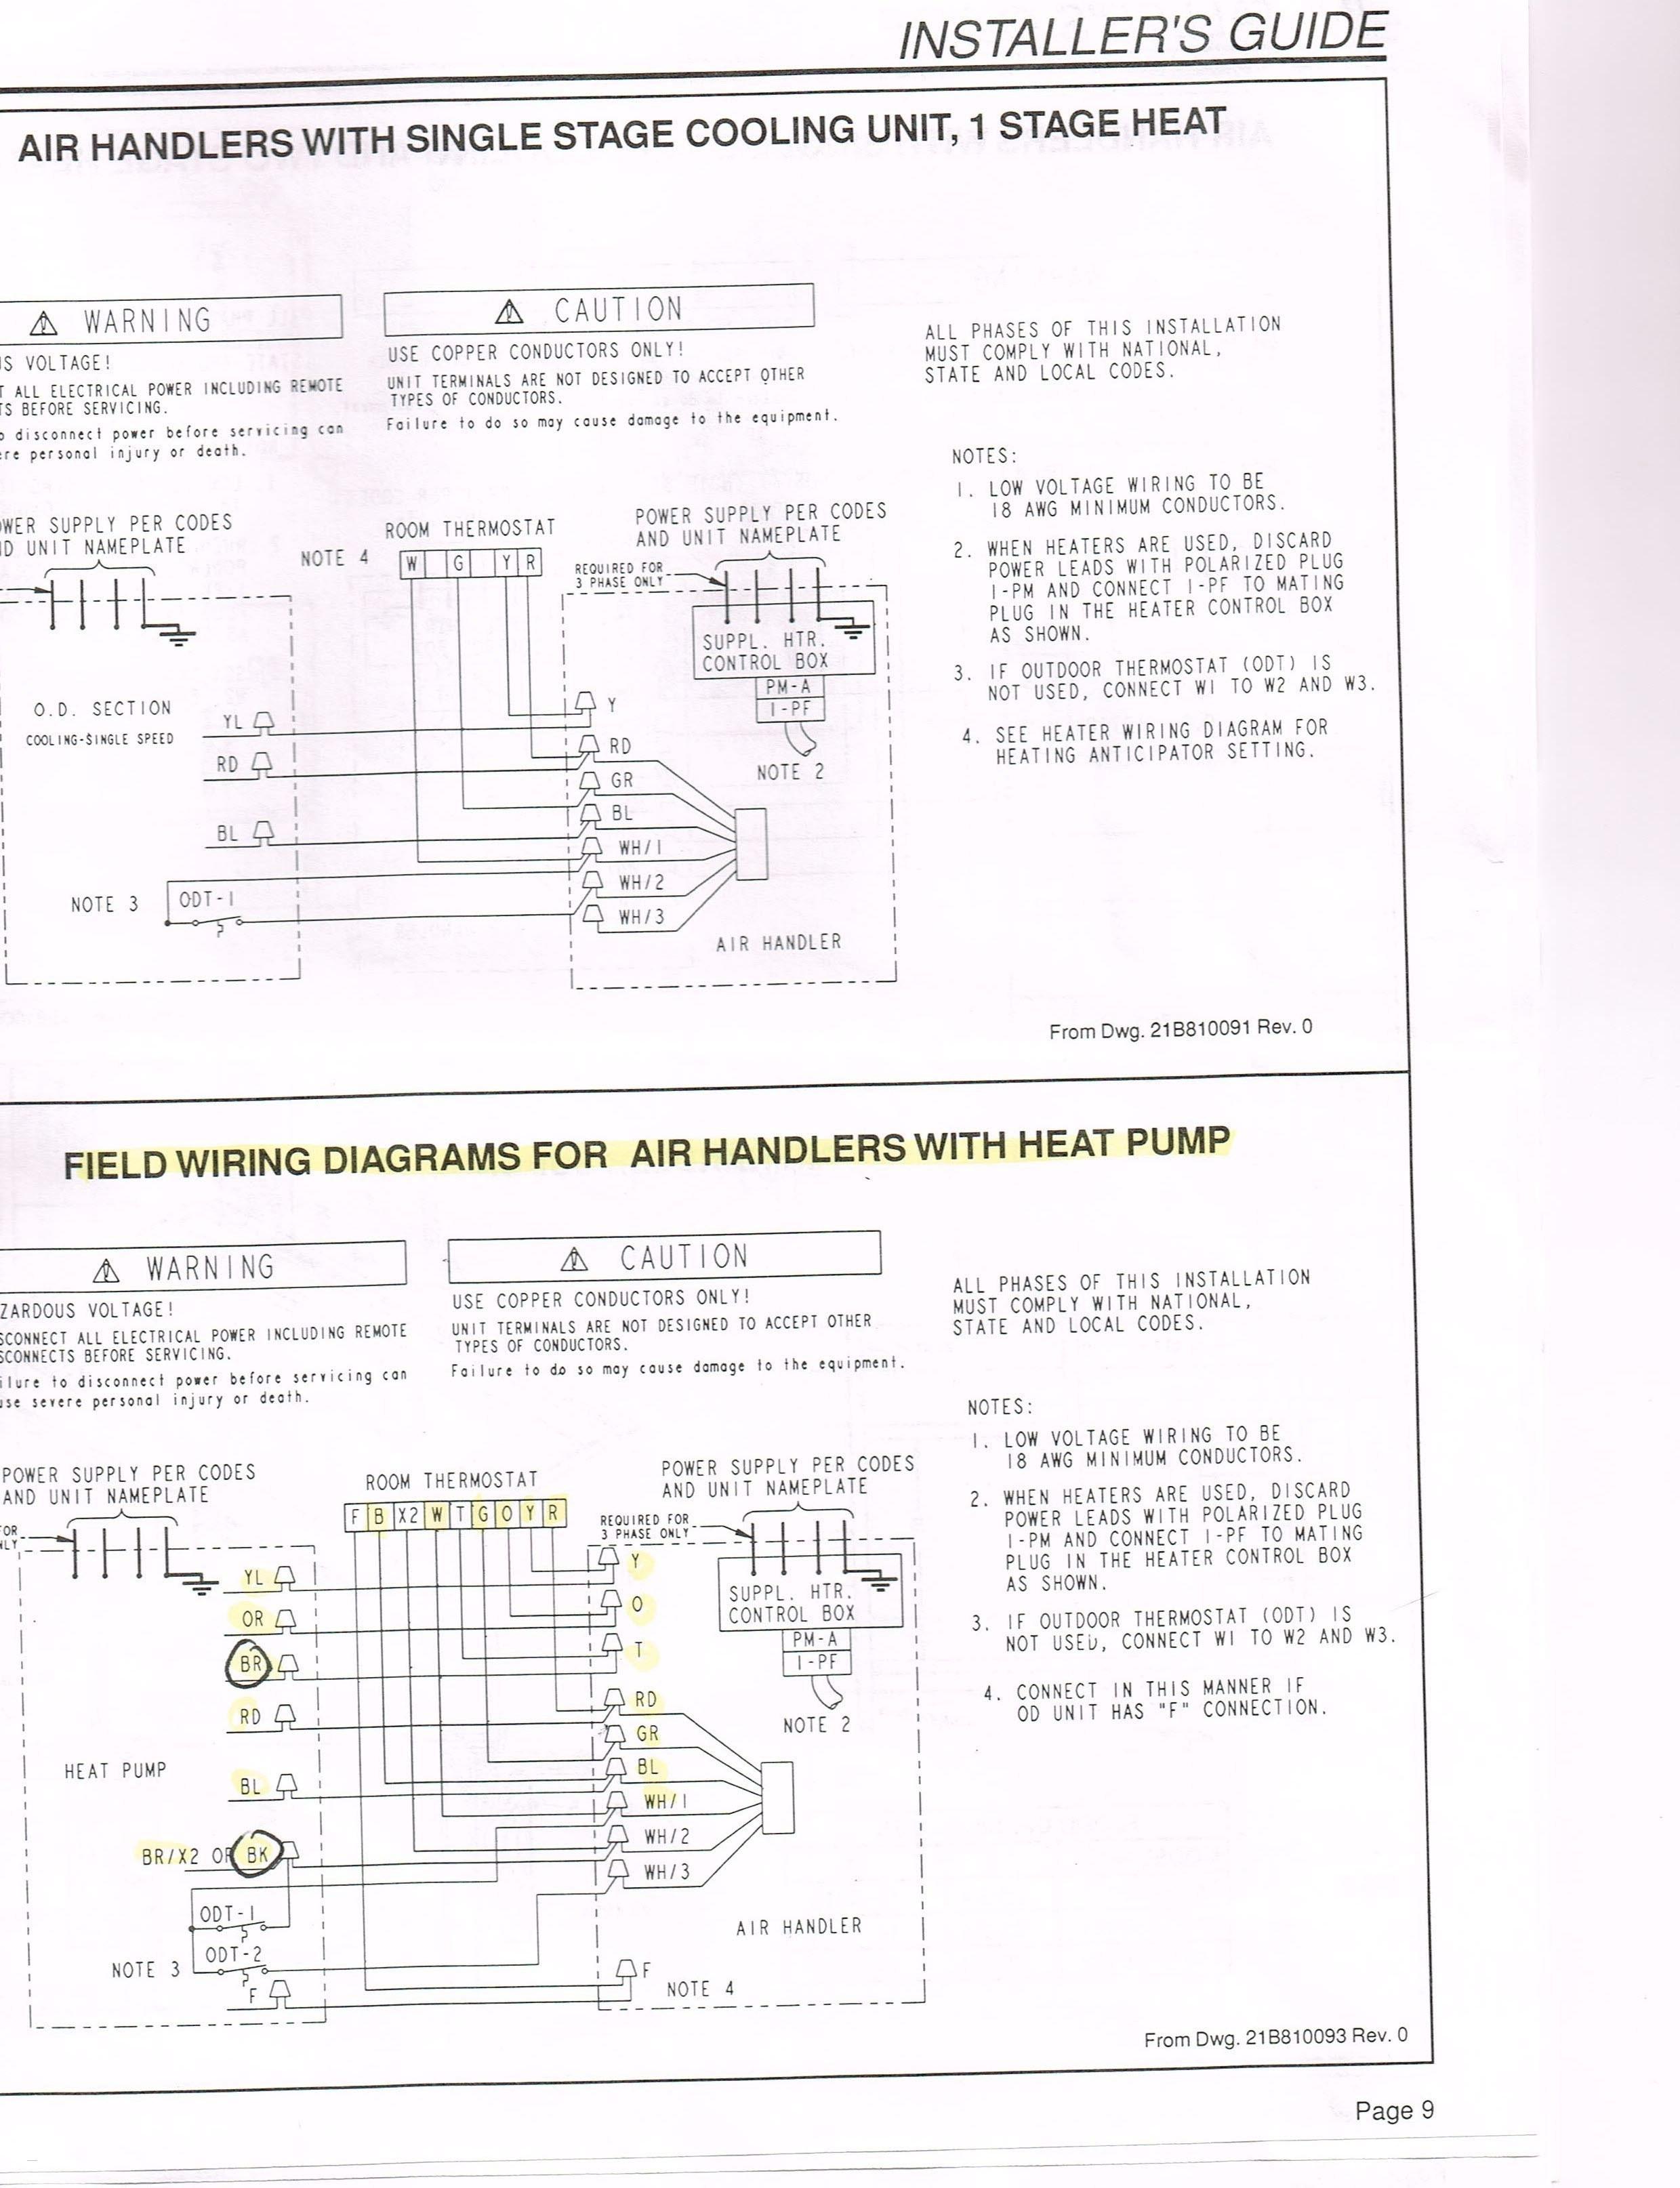 3 Phase Wiring Diagram 3 Phase Wiring Diagram House Best Wiring Diagram Warn Winch Archives Of 3 Phase Wiring Diagram Wiring Diagram Three Phase Generator Best 3 Phase Wiring Diagram